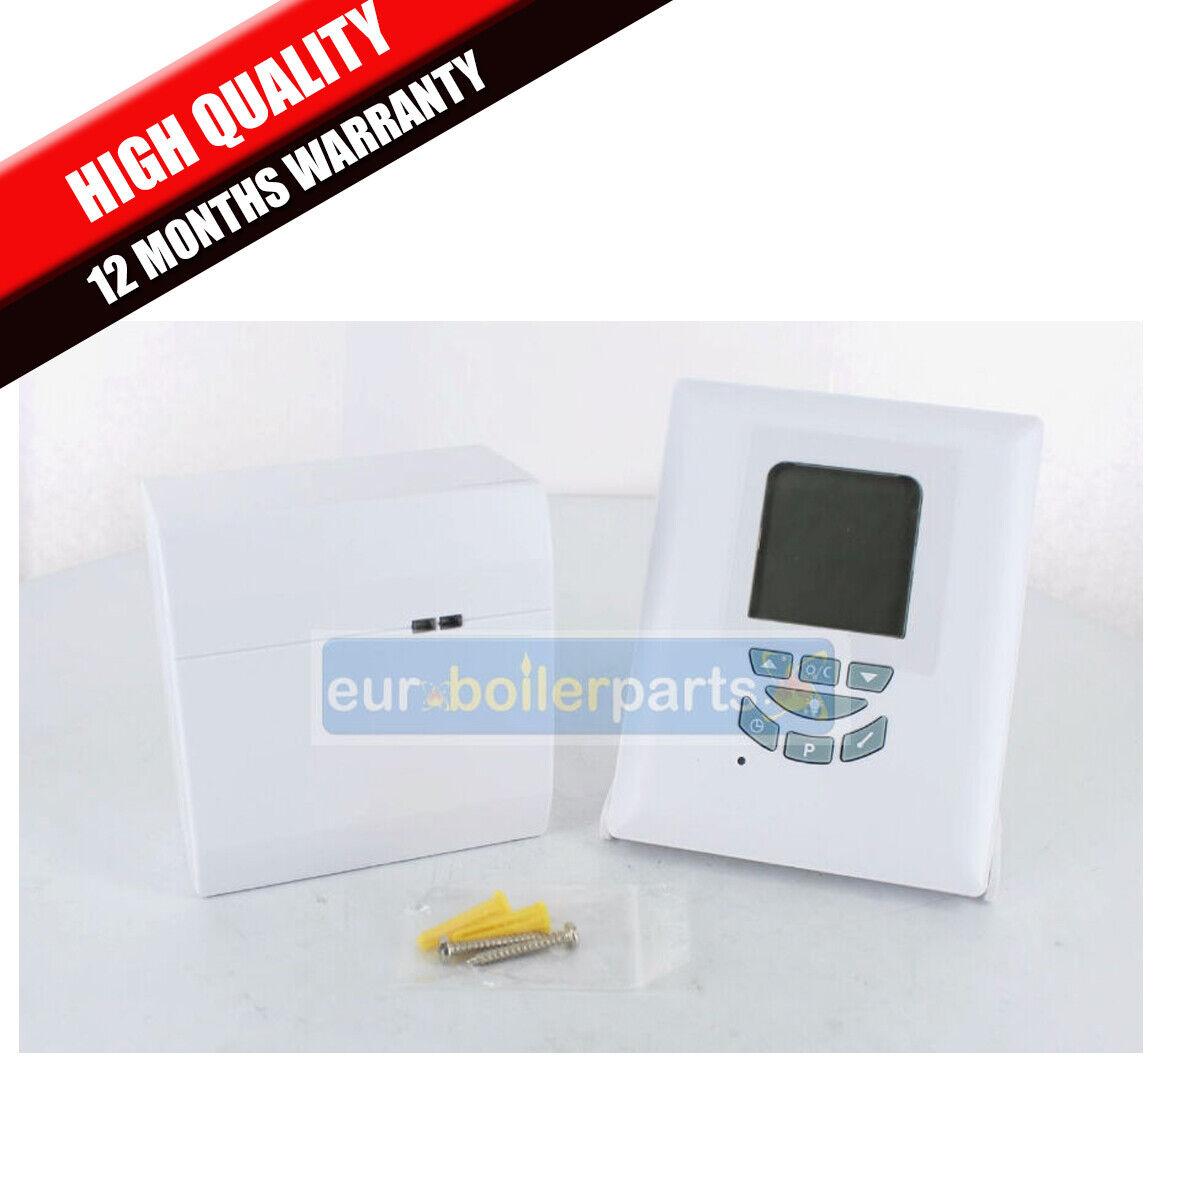 HORSTMANN HRFS Digital RF PROGRAMMABLE Thermostat Receiver